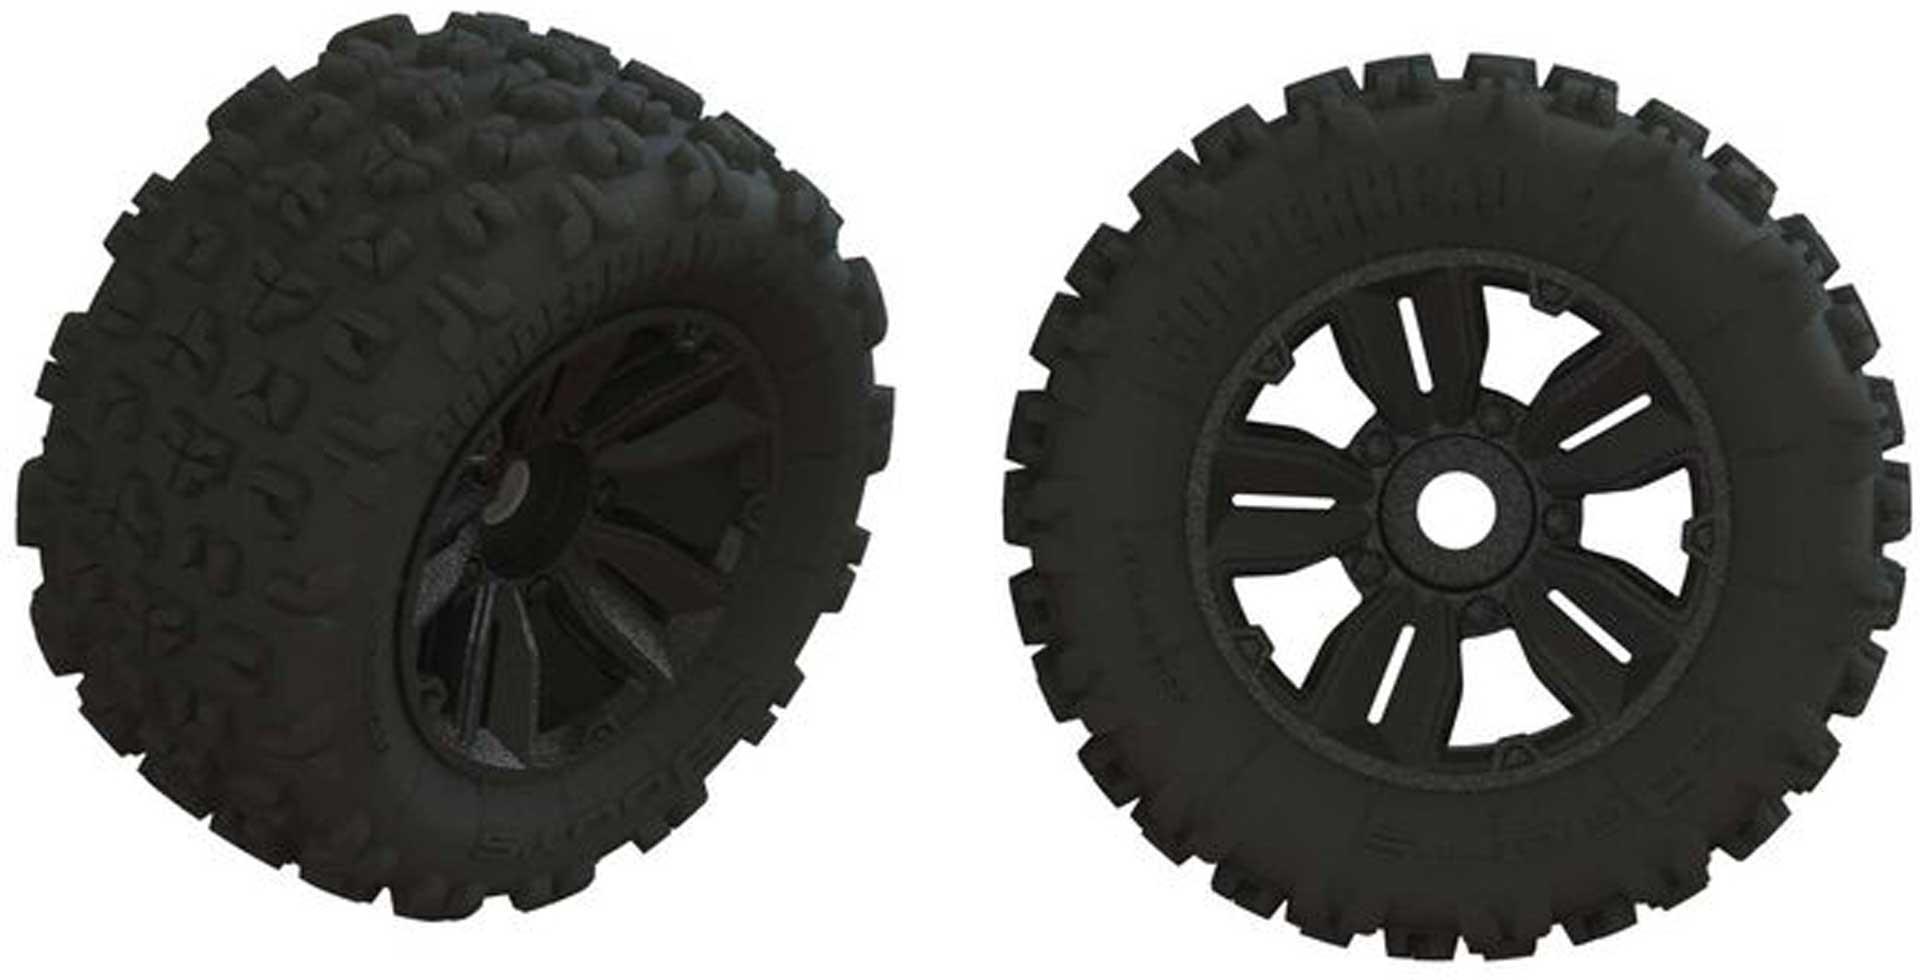 Arrma Dboots 'Copperhead2 SB MT' Tire Set Glued (1 Pair)